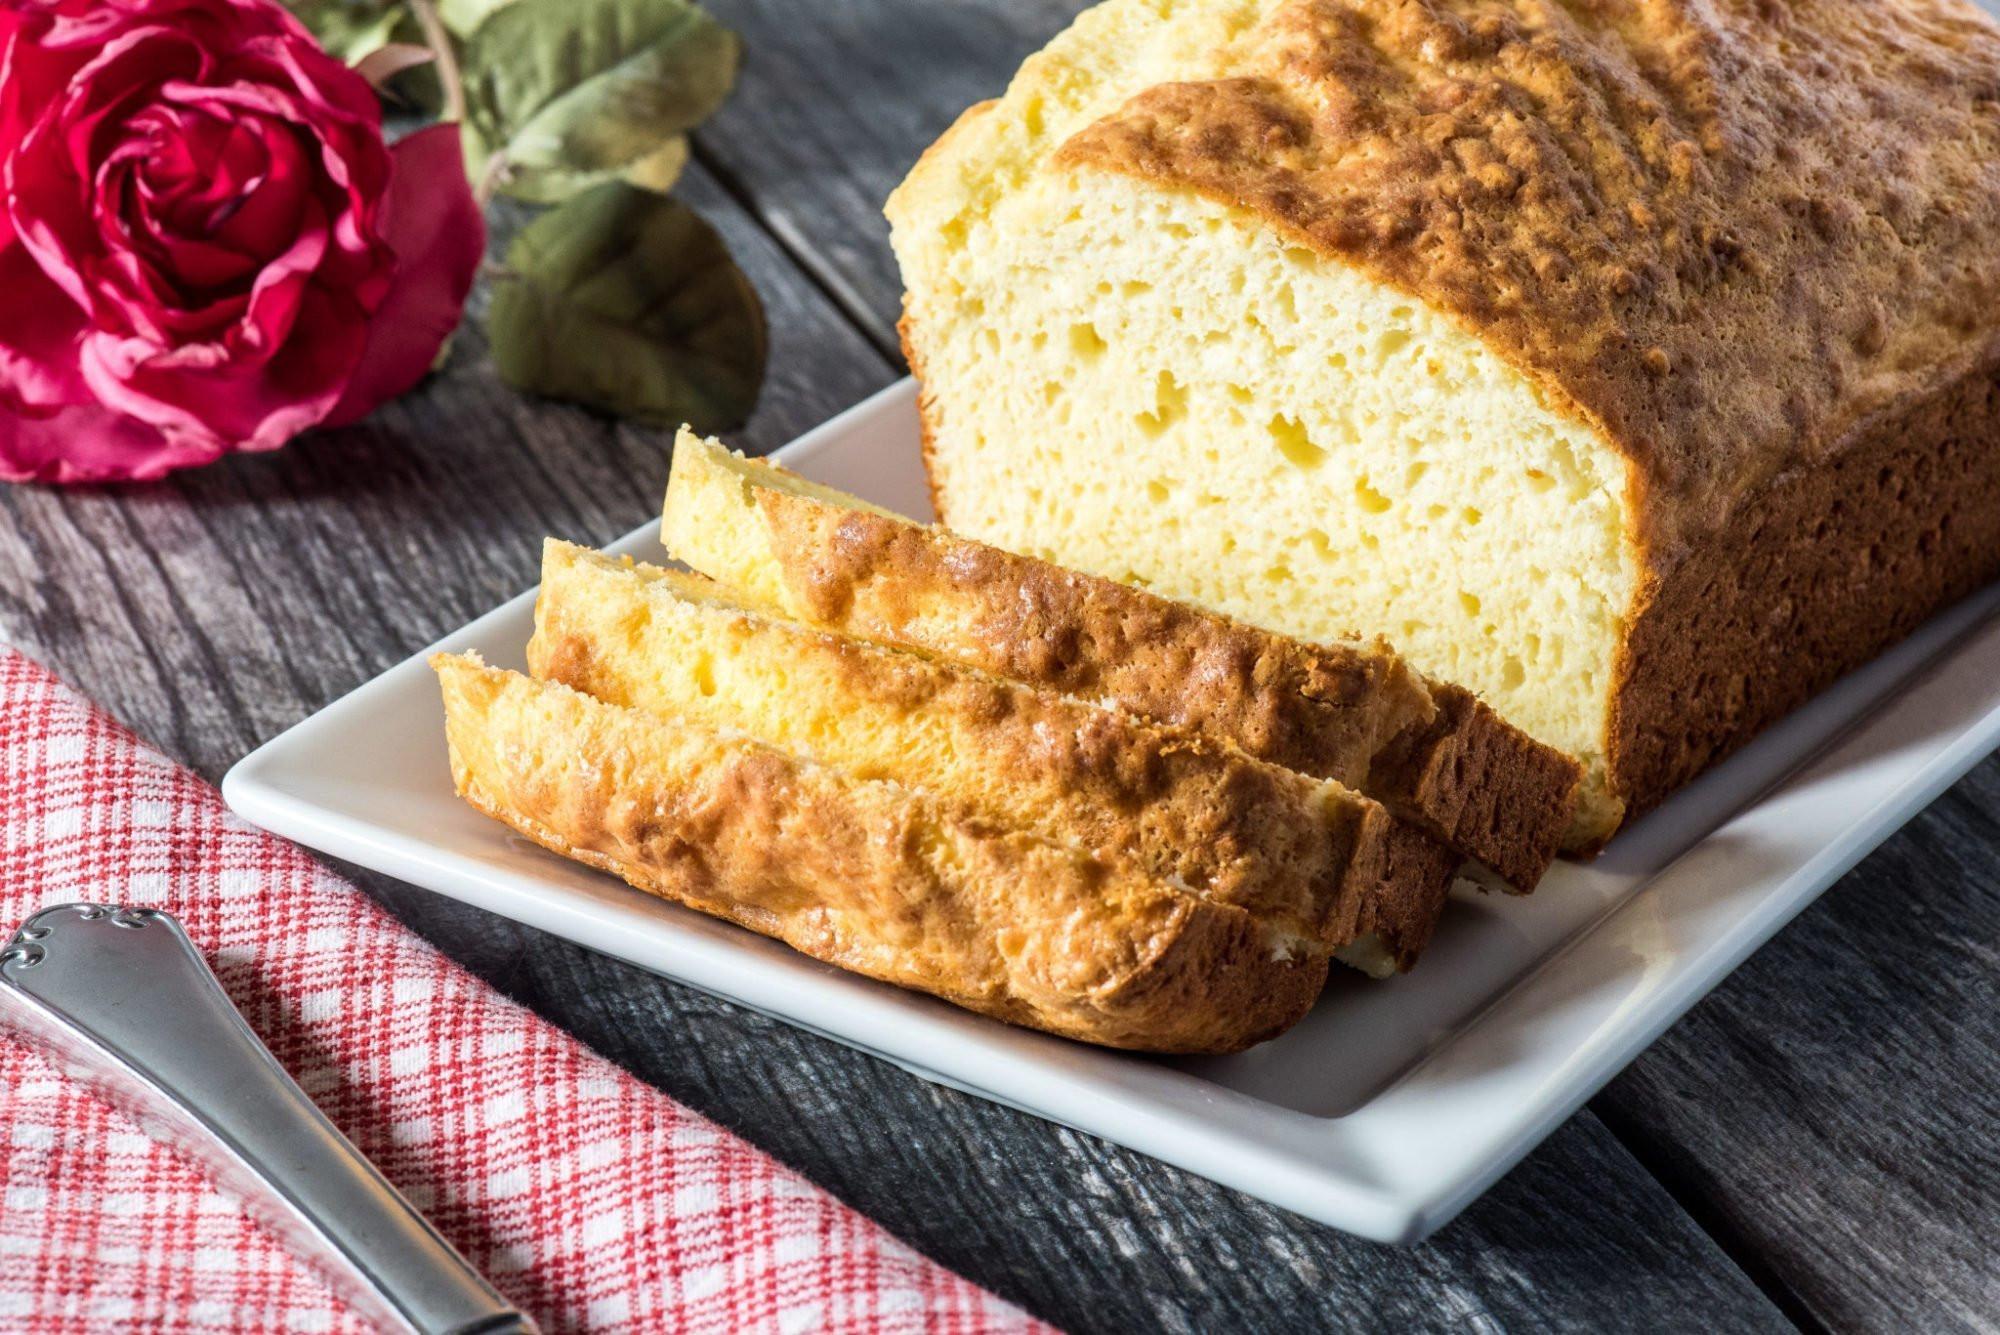 Atkins Low Carb Bread  Low Carb Soul Bread Original Recipe Tasty Low Carb